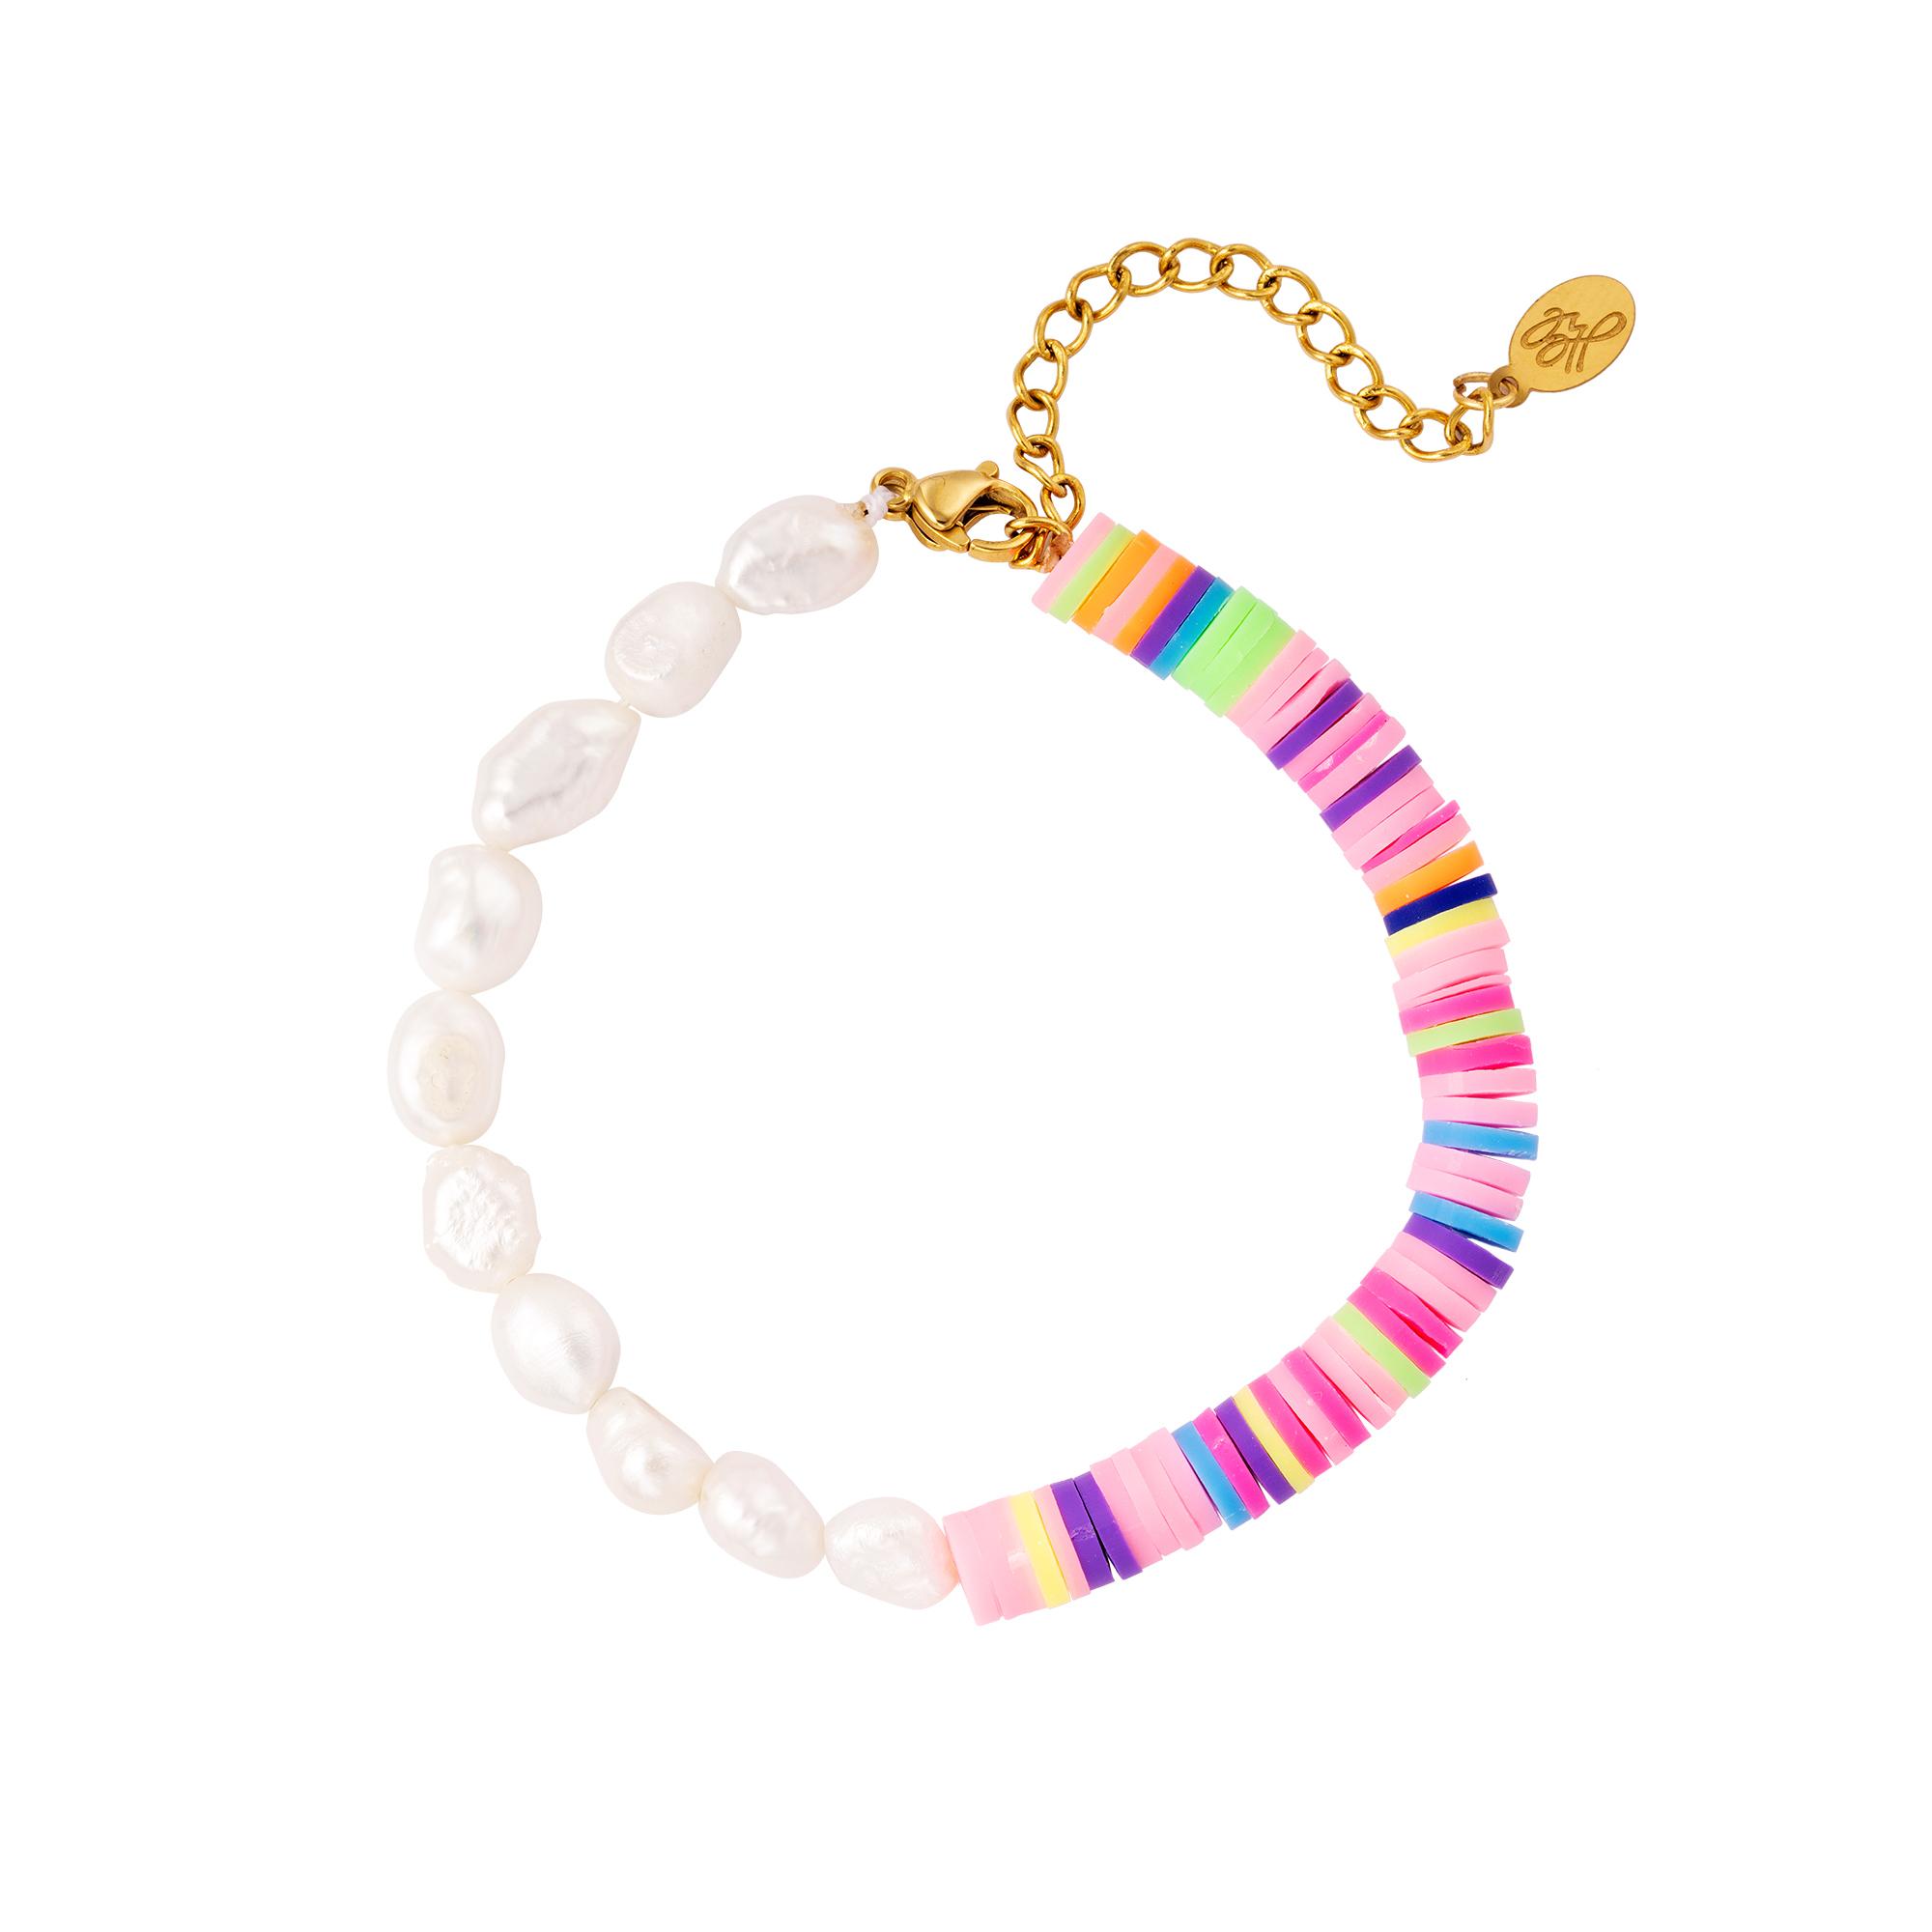 Armband regenboogkleuren